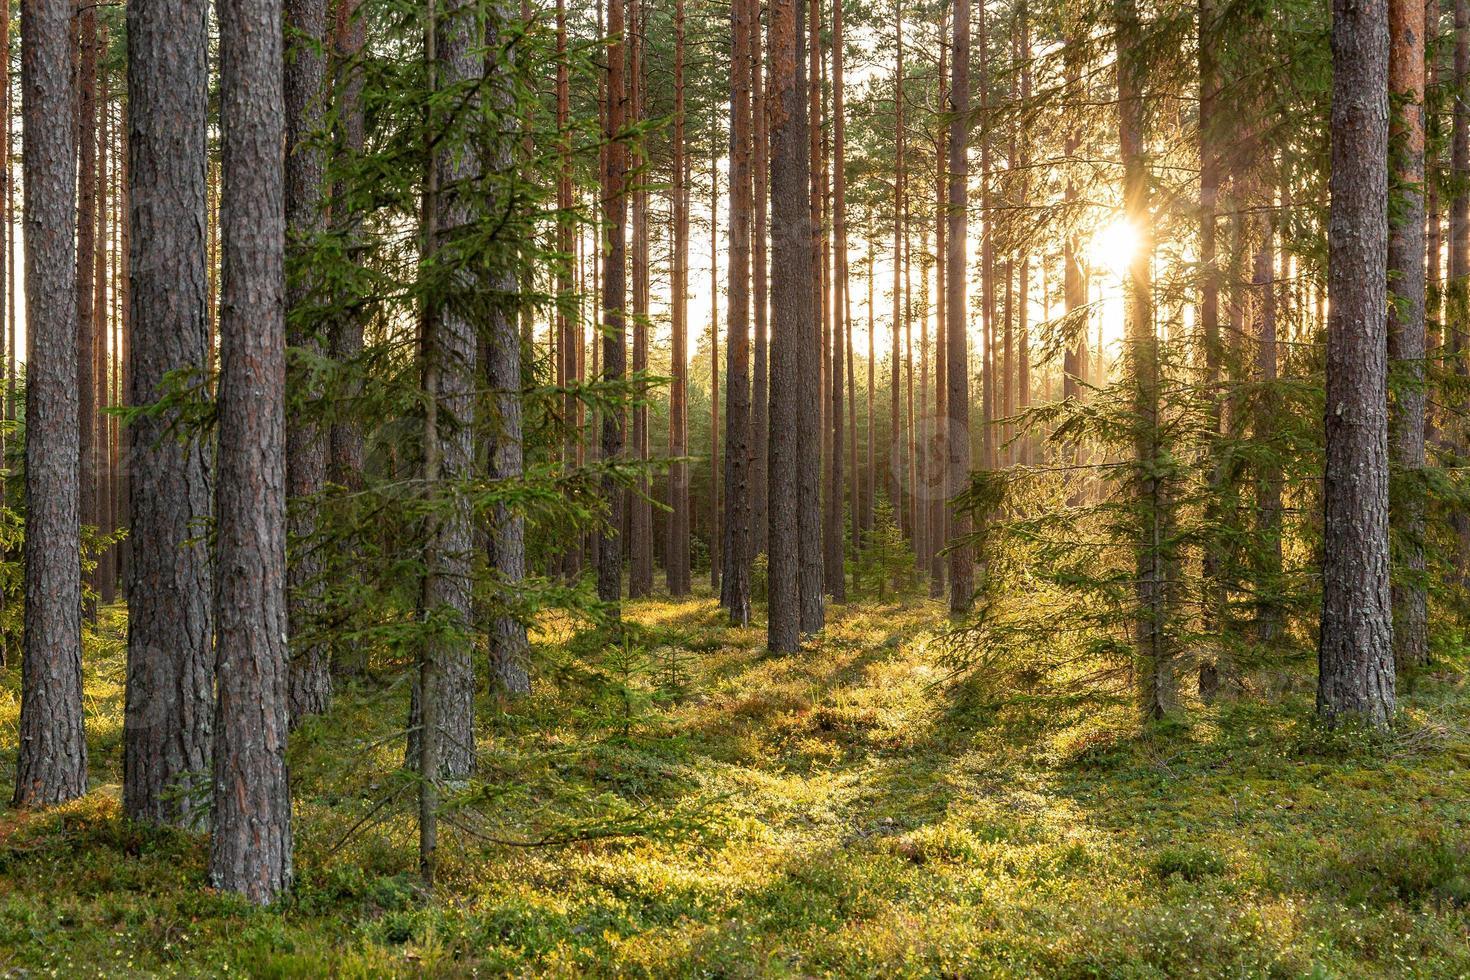 bosscène met bemoste grond in Letland foto